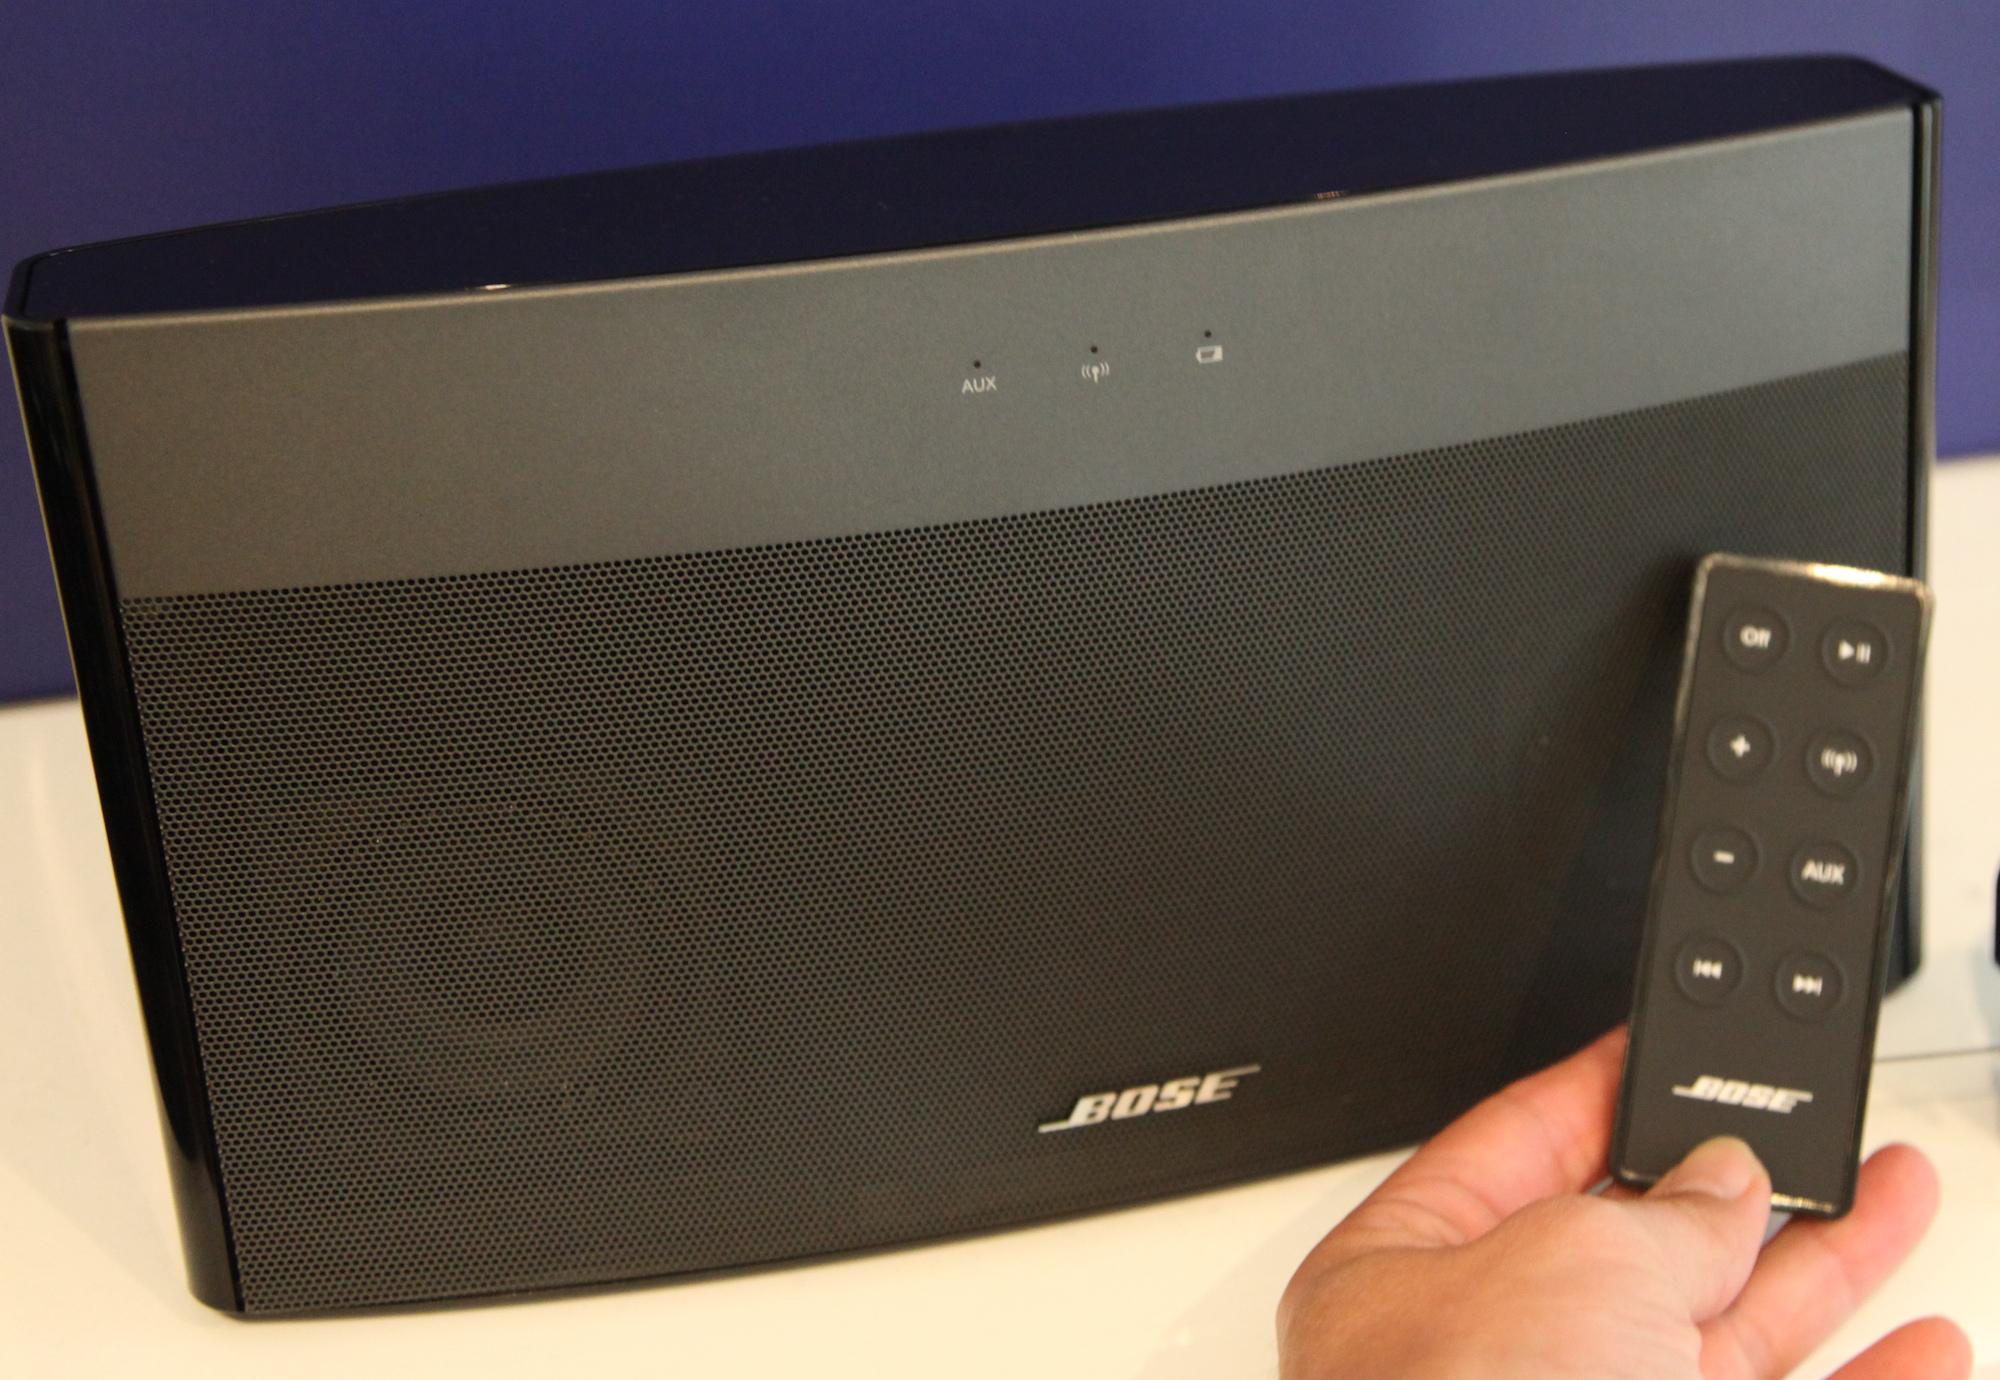 Description Bose SoundLink Wireless music system.jpg